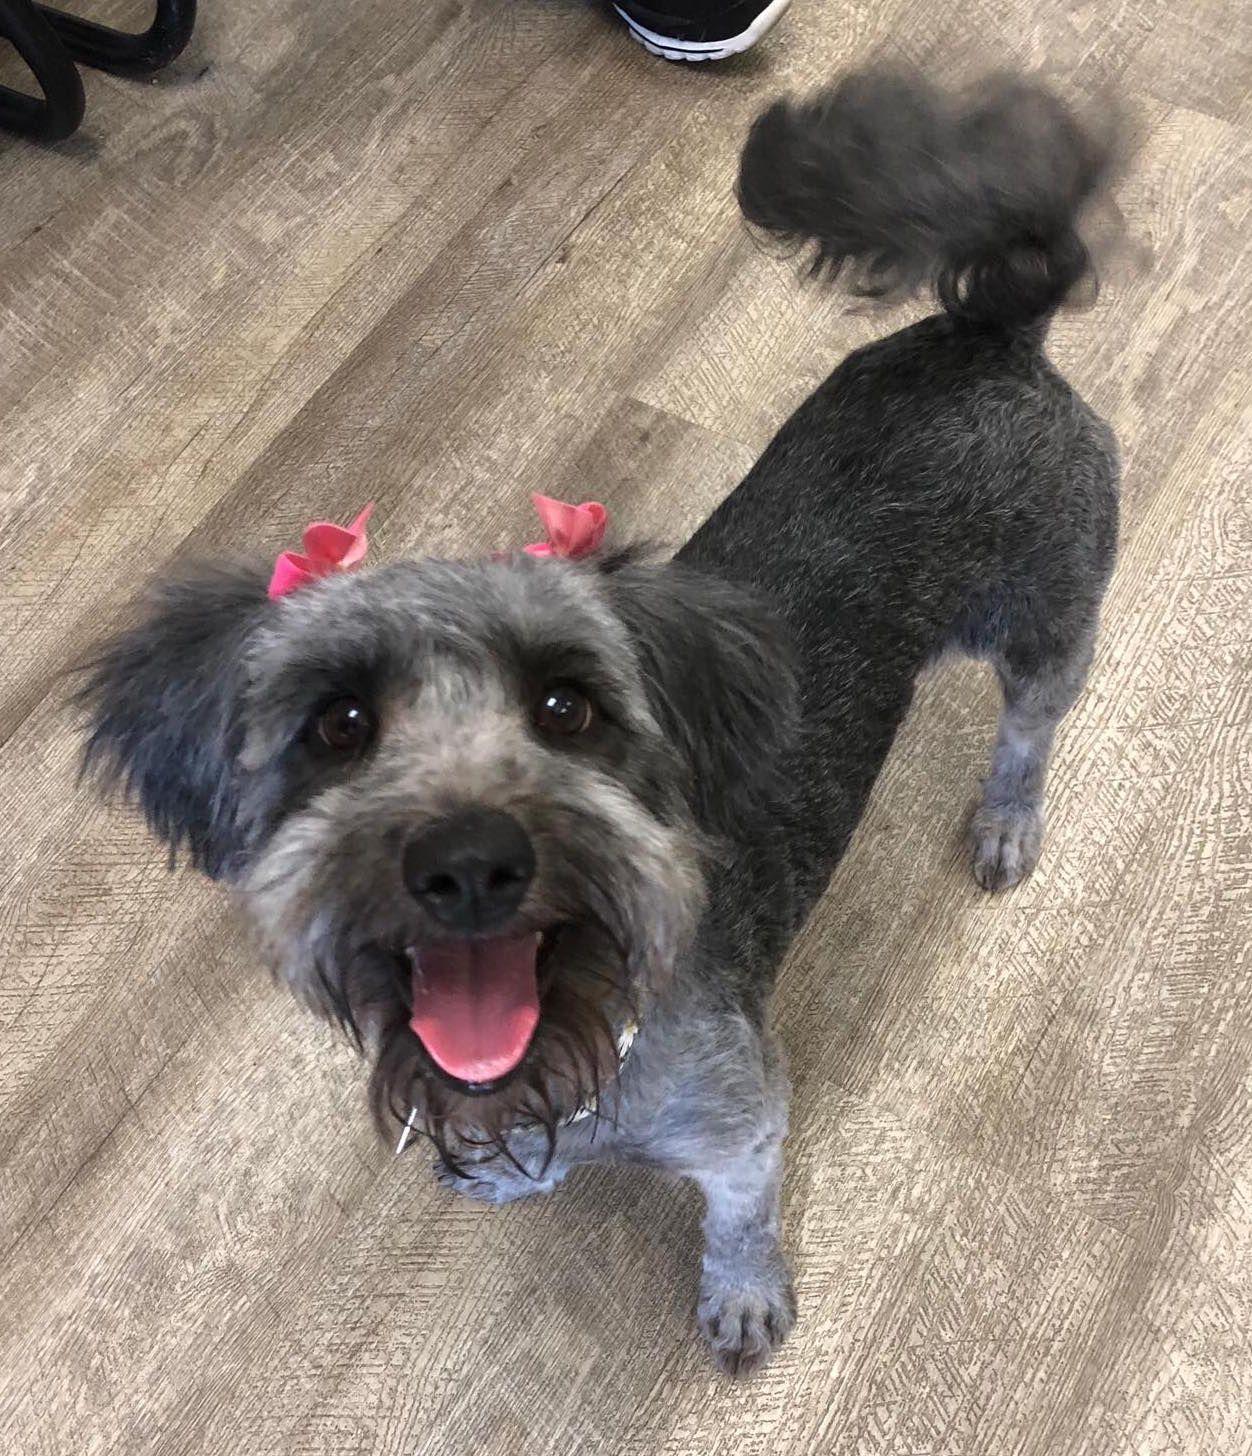 Happy Tails – The Pet Adoption Center of Orange County